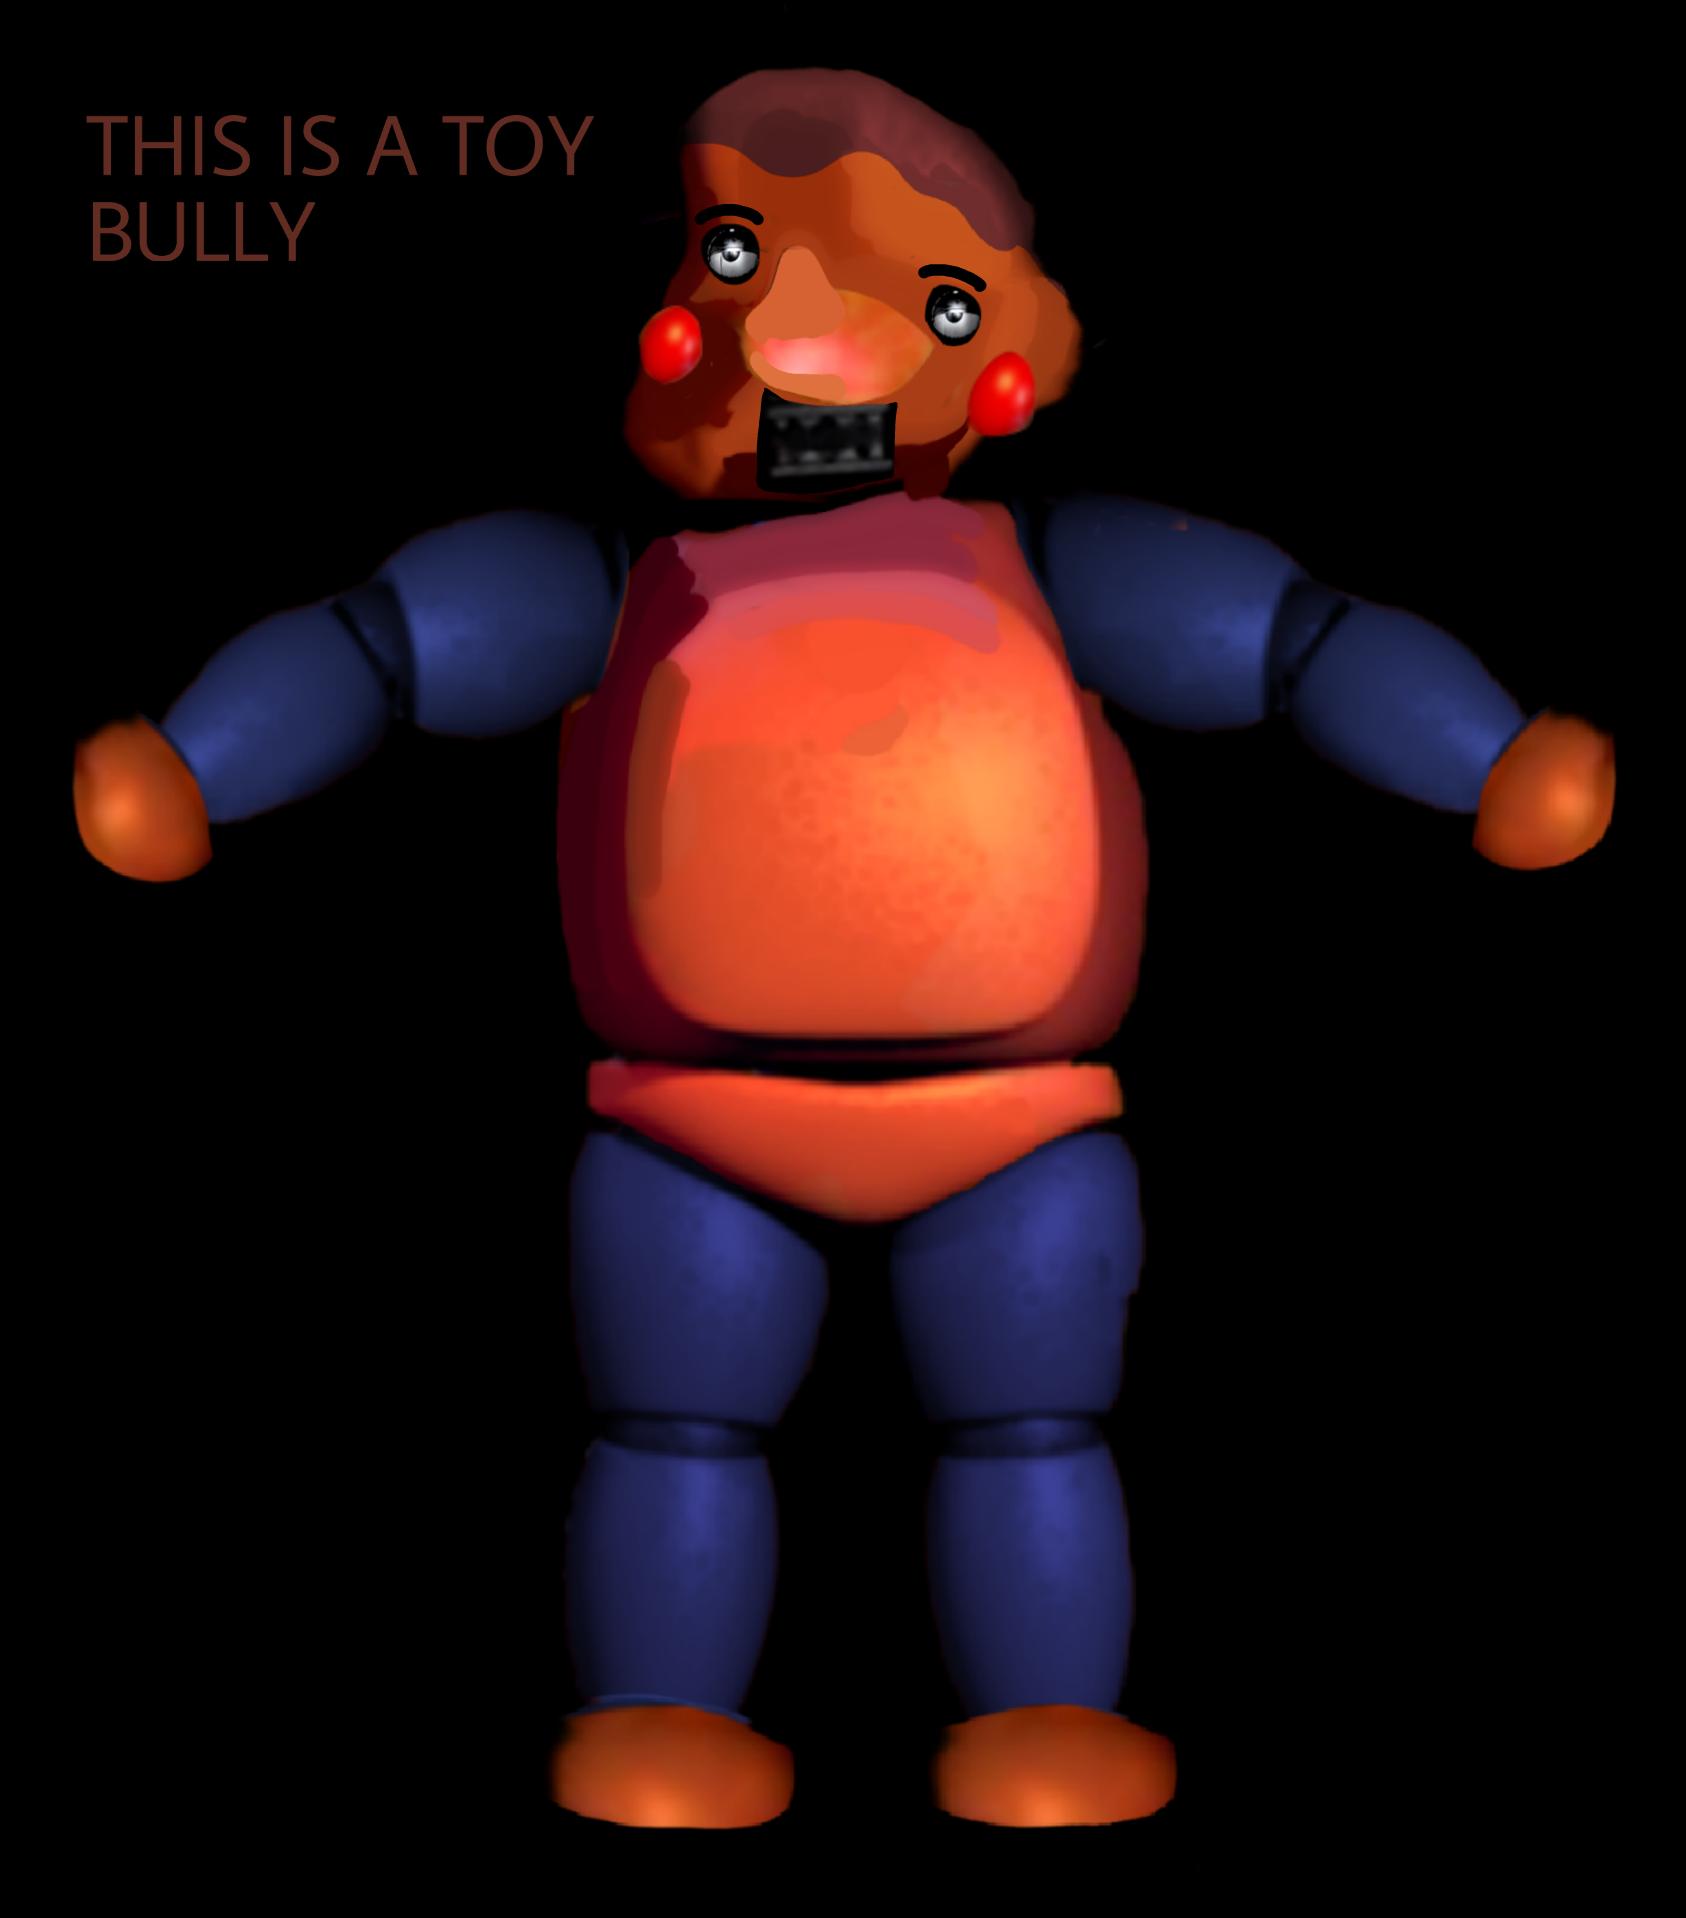 Baldi Characters Bully Toy Bully Baldi S Basics Fanon Wiki Fandom basics fanon wiki fandom